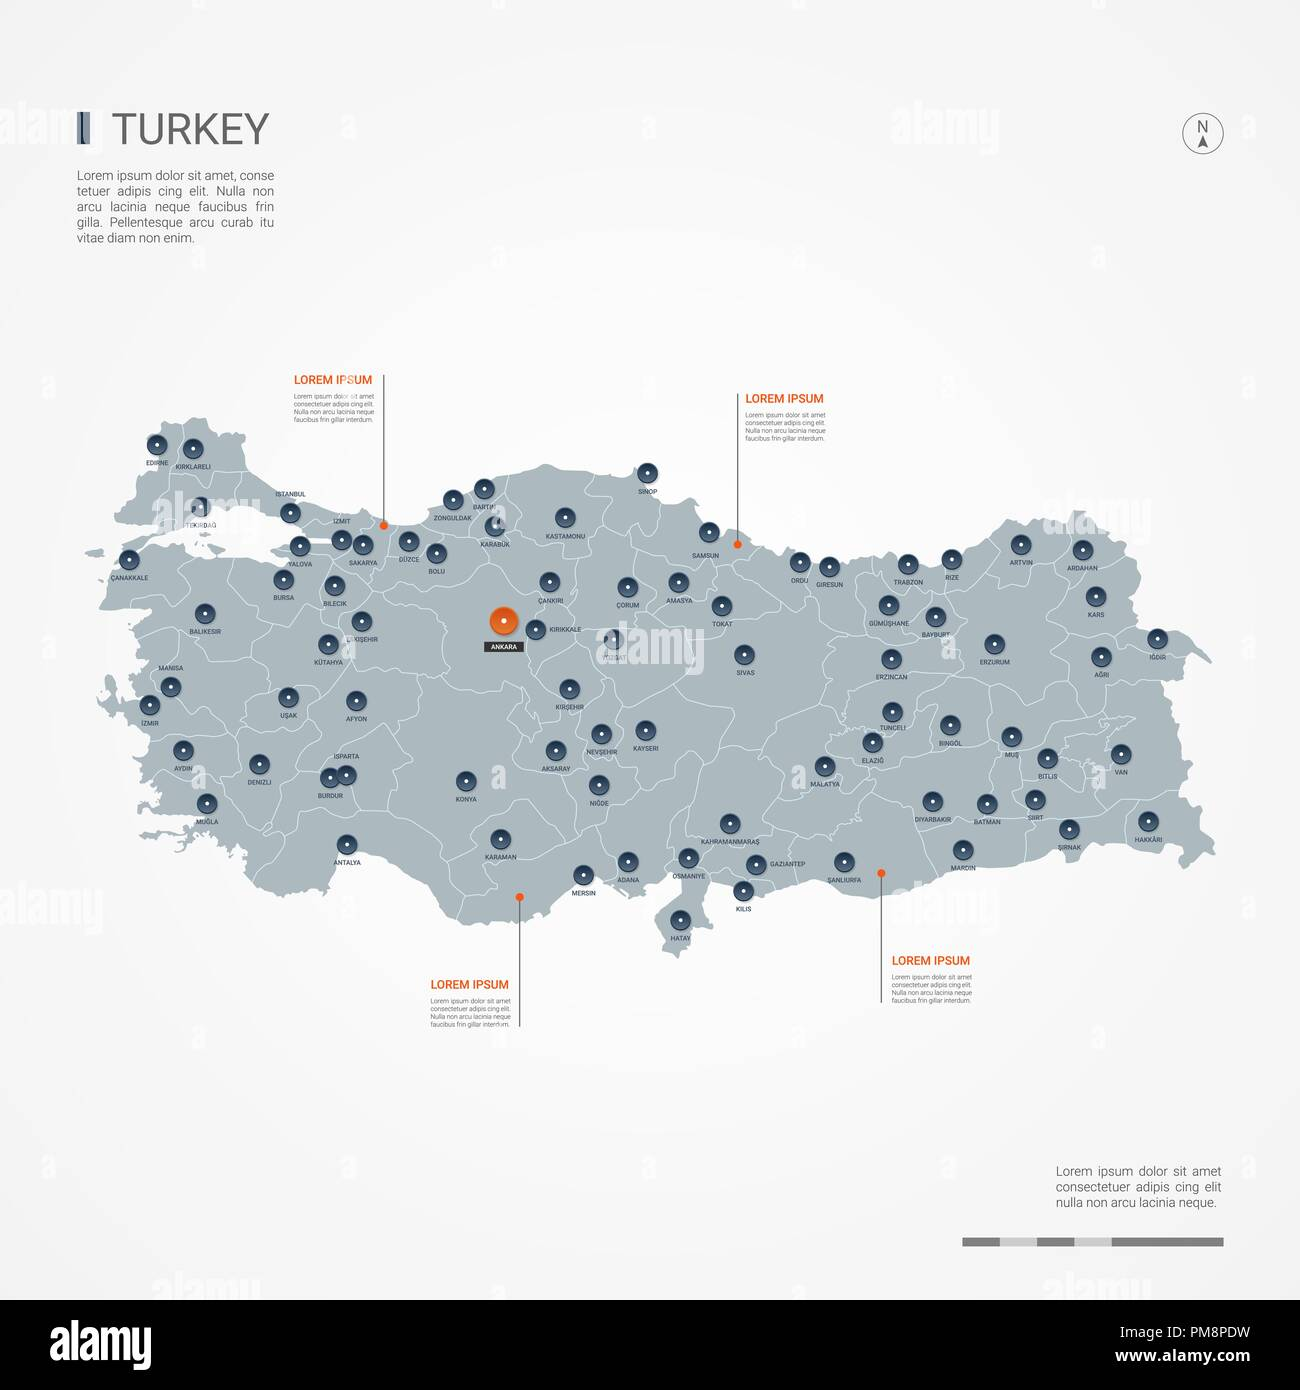 d32a8e3e48 Turkey map with borders